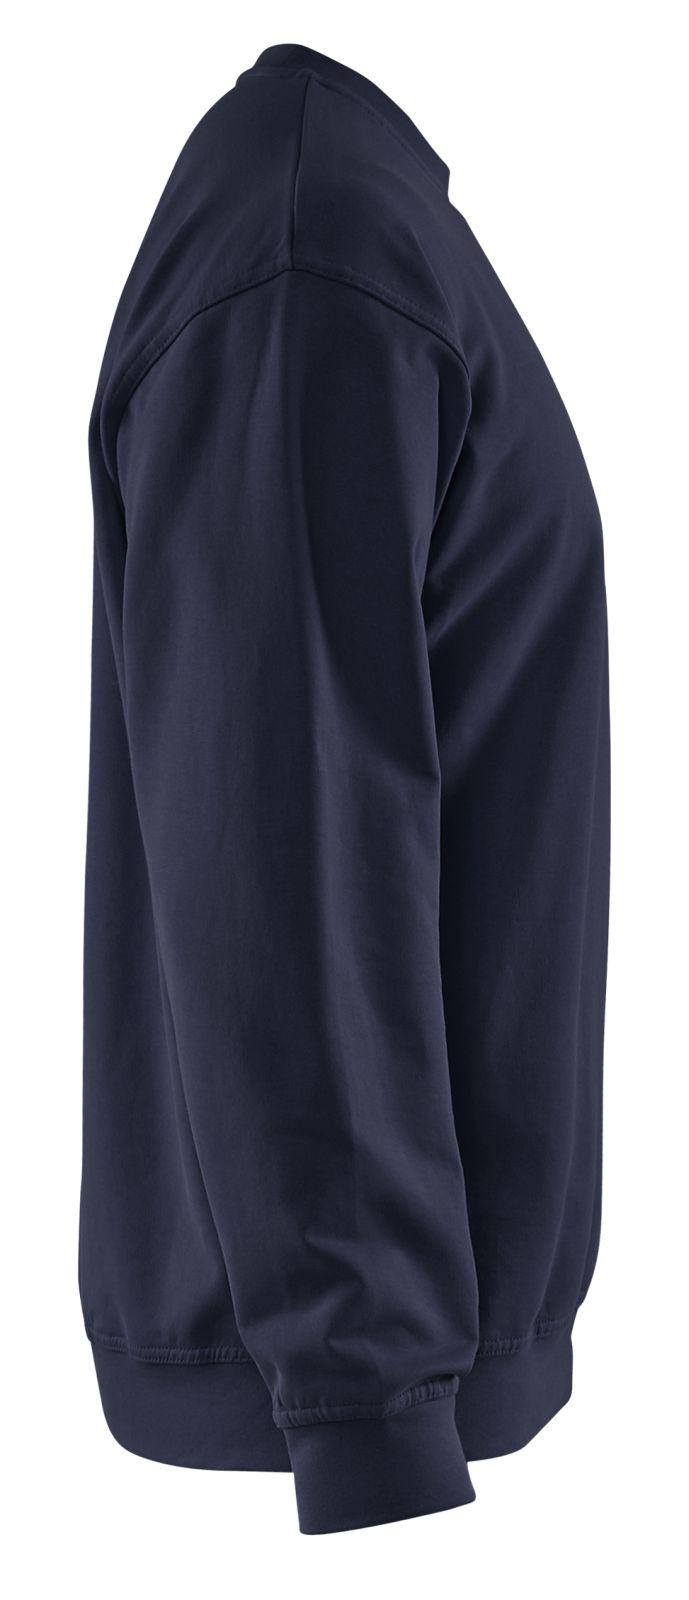 Blaklader Sweatshirts 33401158 marineblauw(8600)